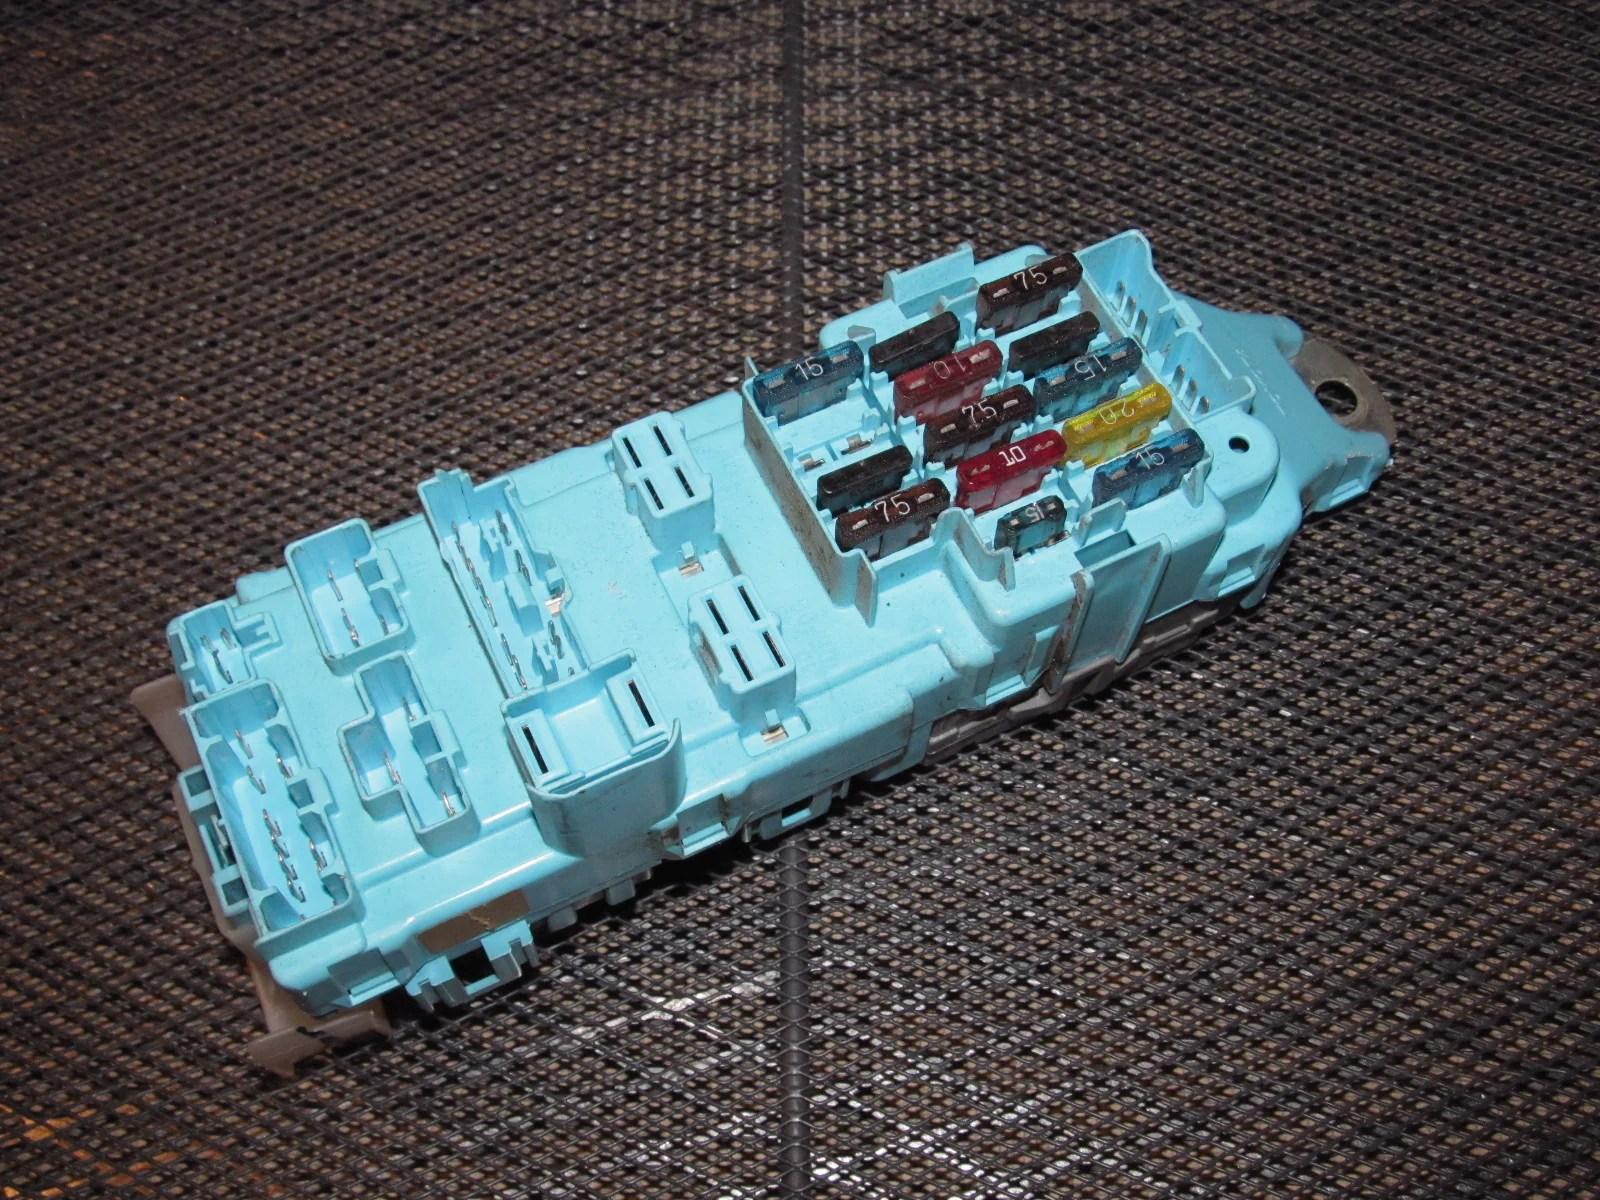 91 92 toyota supra oem interior fuse box product image  [ 1600 x 1200 Pixel ]